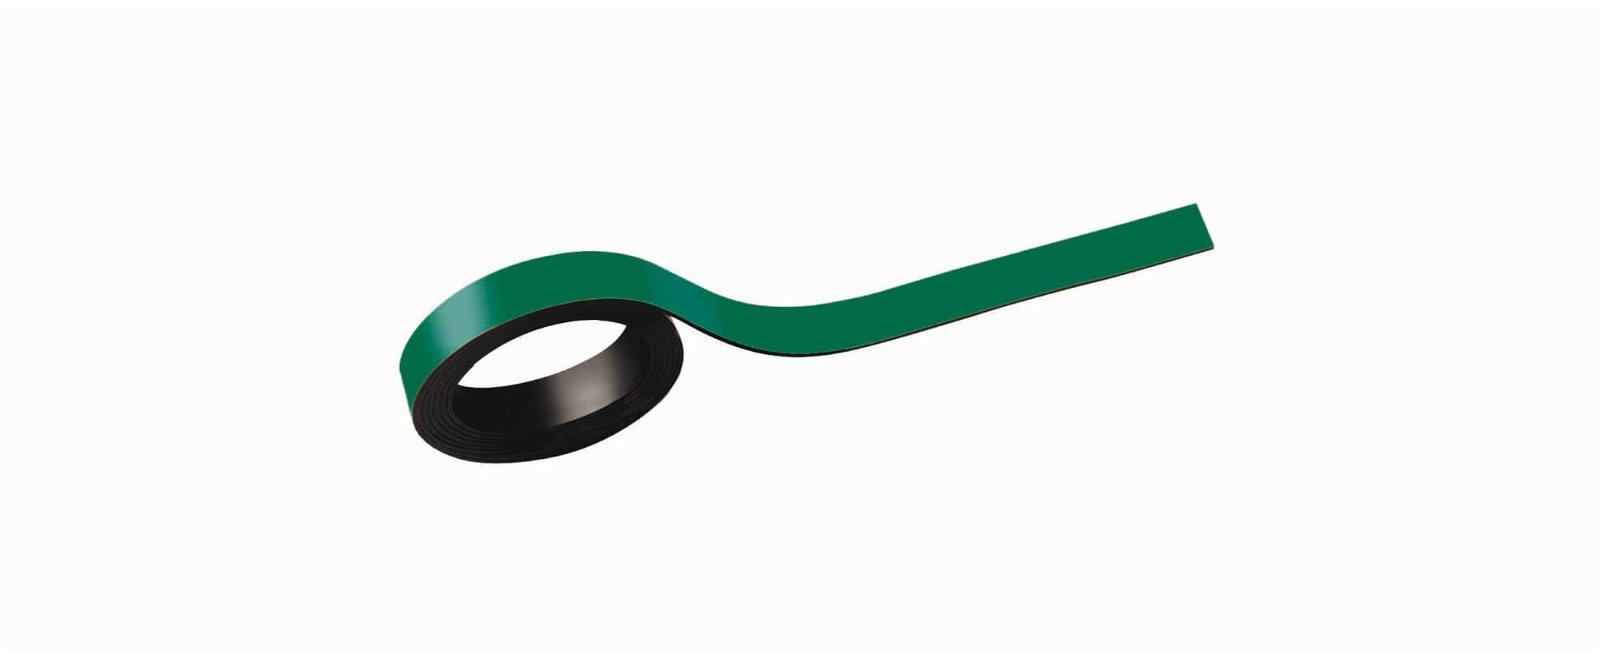 Magnetstreifen, 1x100 cm, 2 St./Set, grün